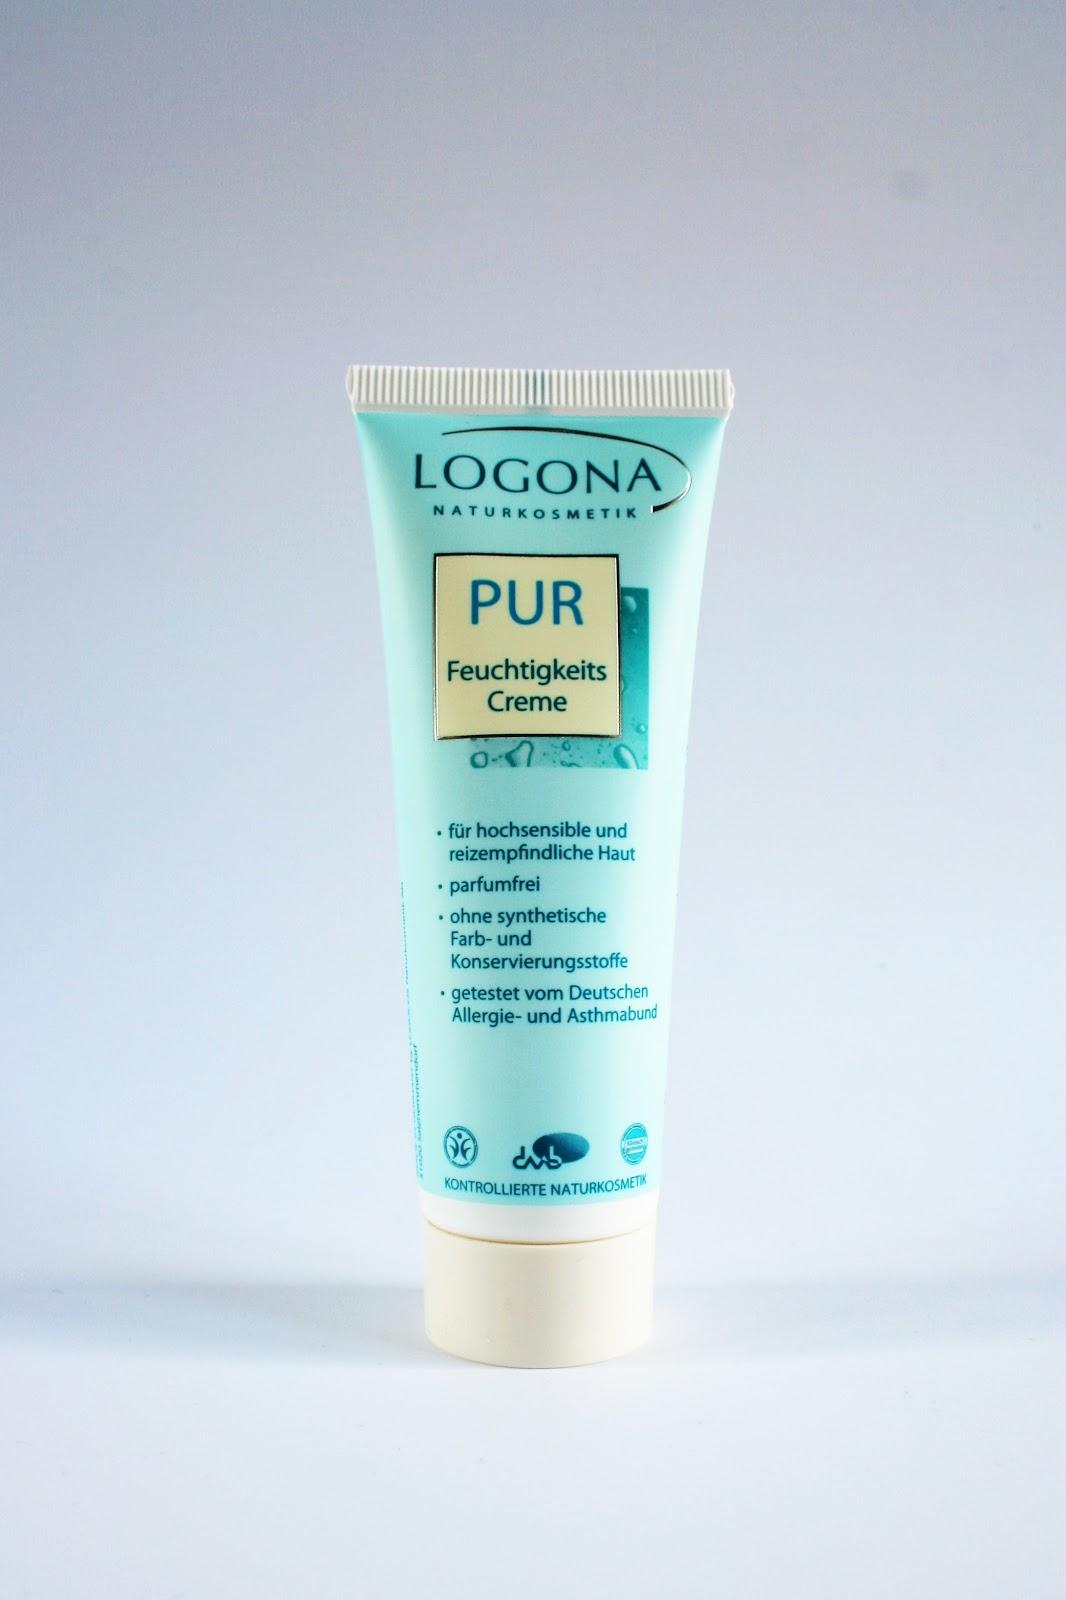 Lorona Pur